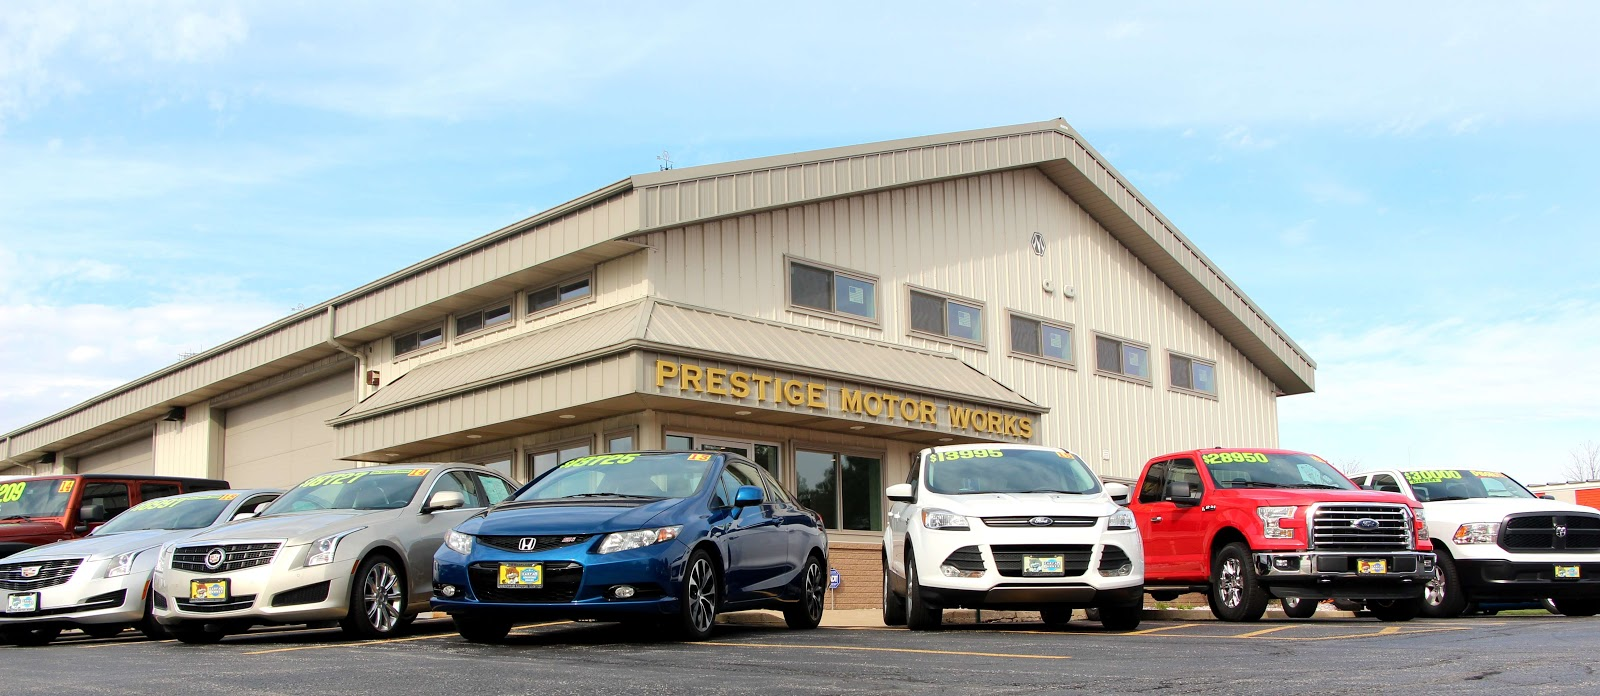 Photo of Prestige Motor Works showroom